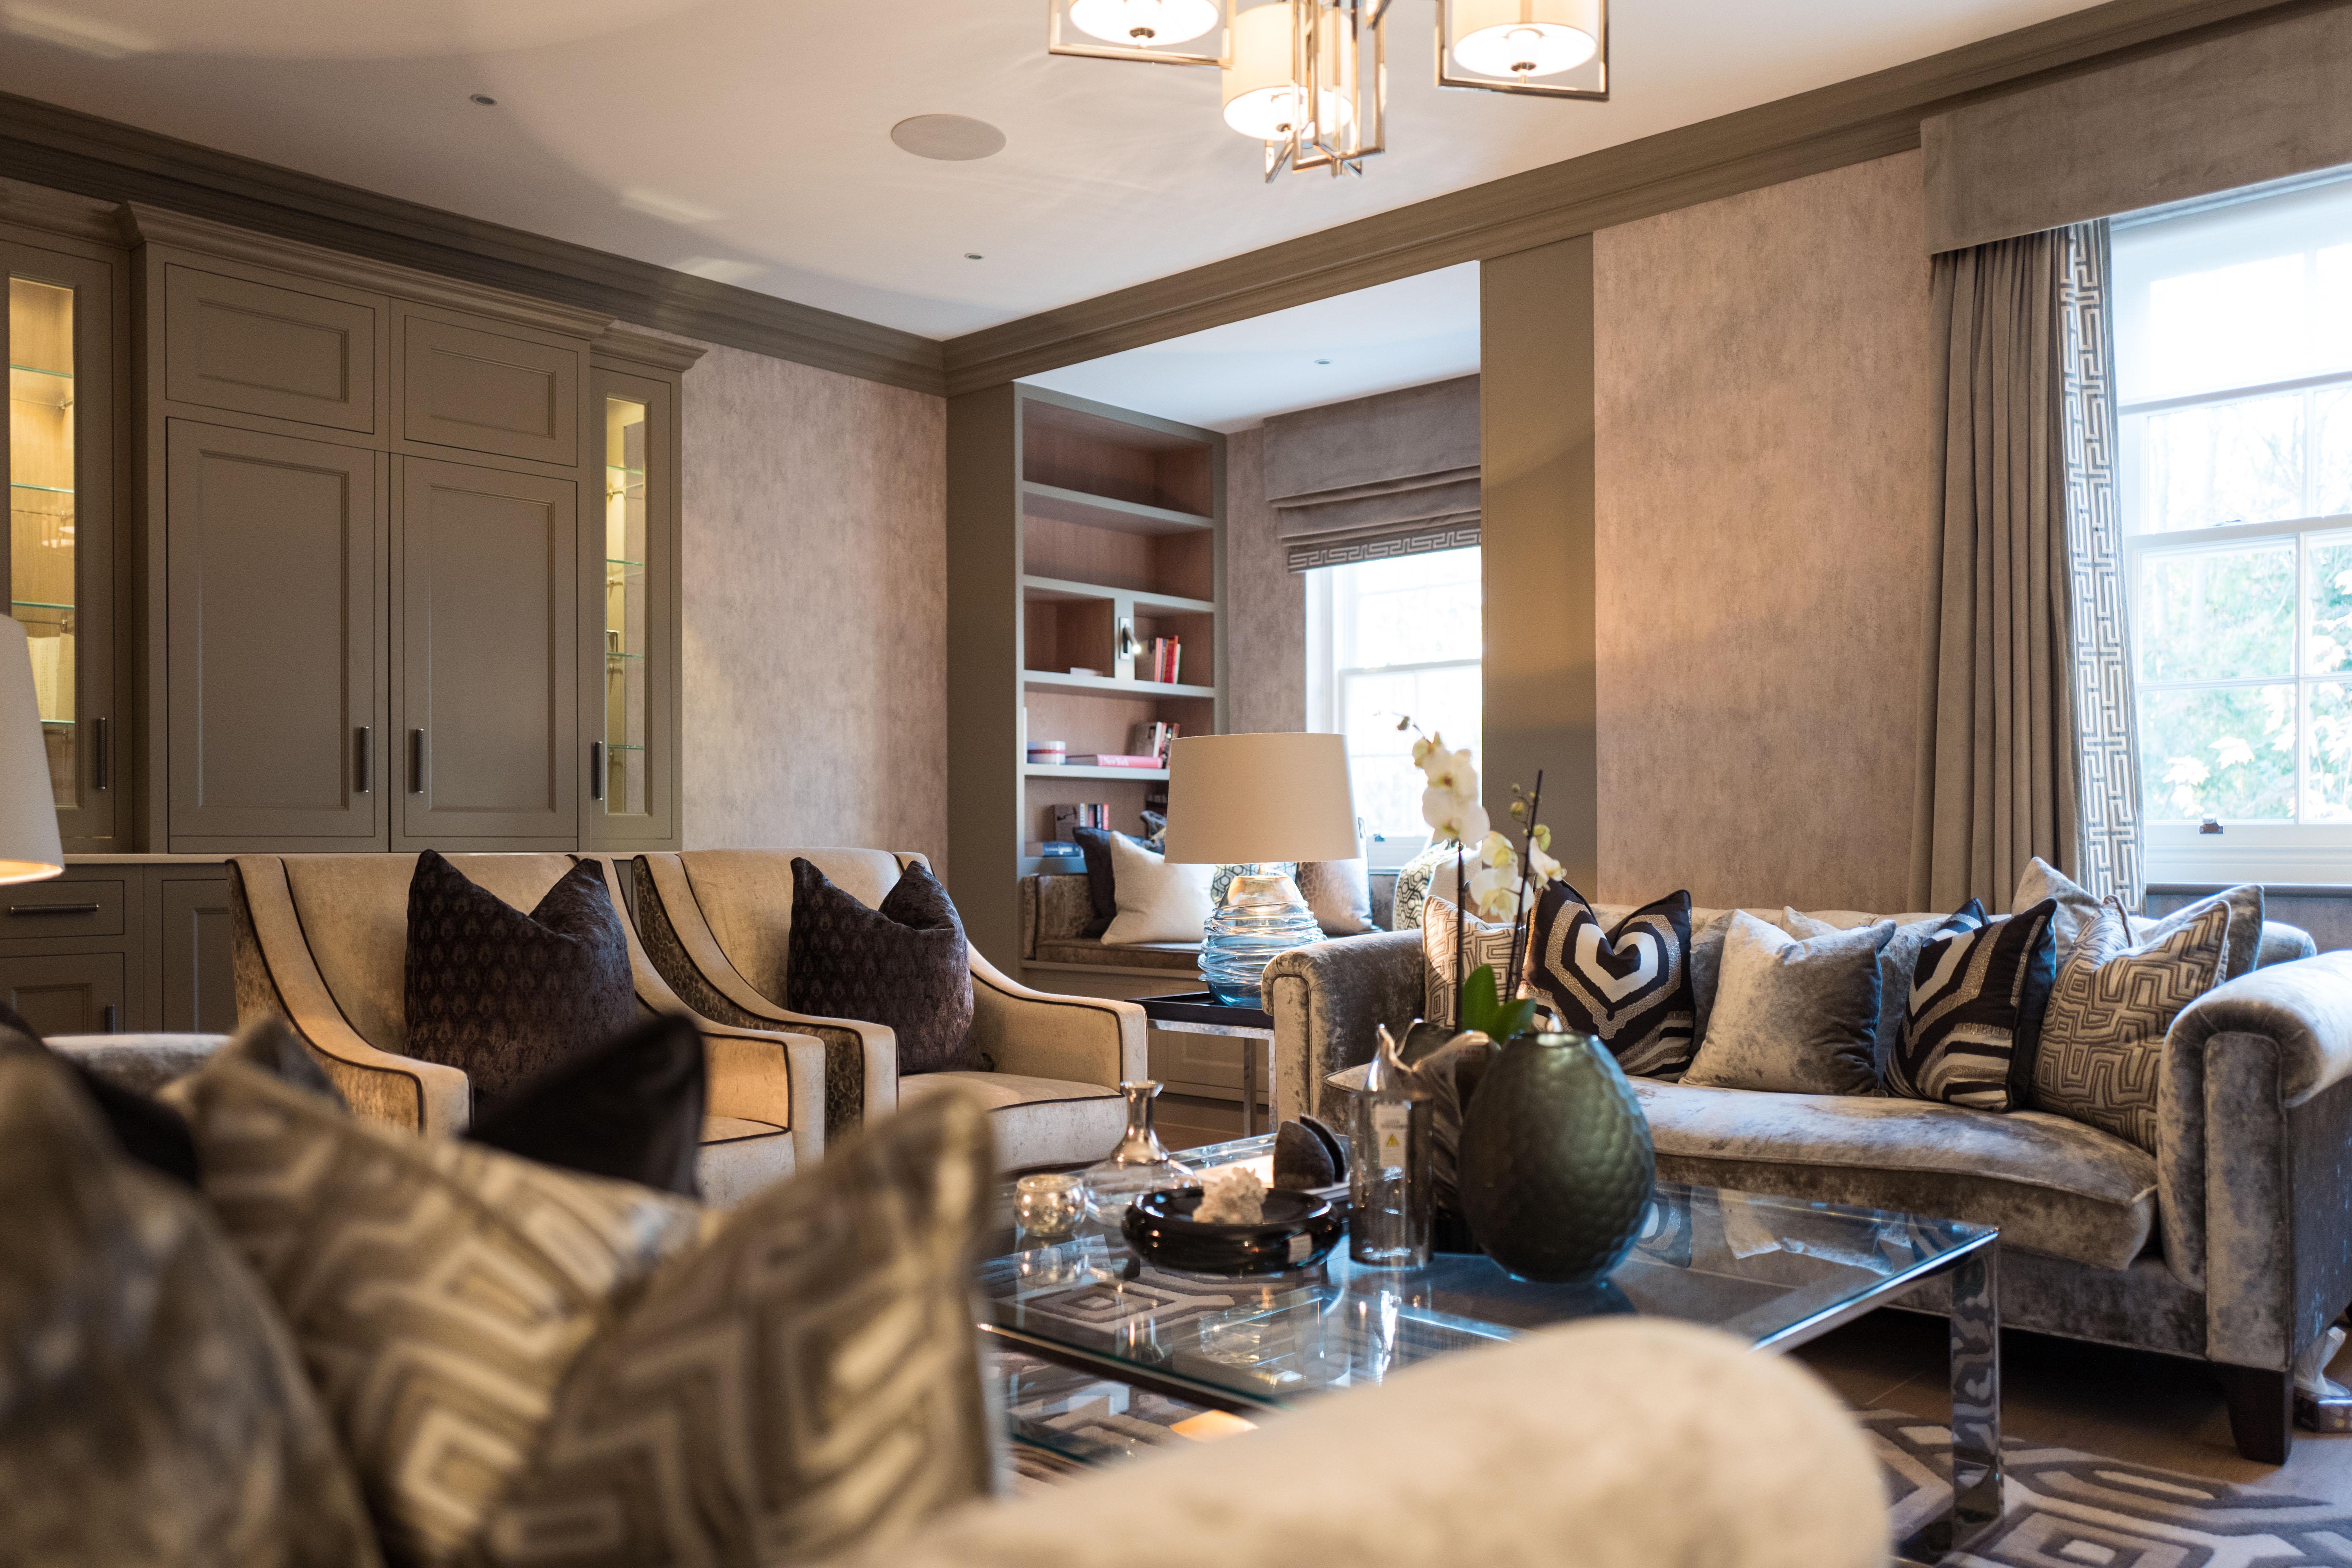 West London interior design living room 1